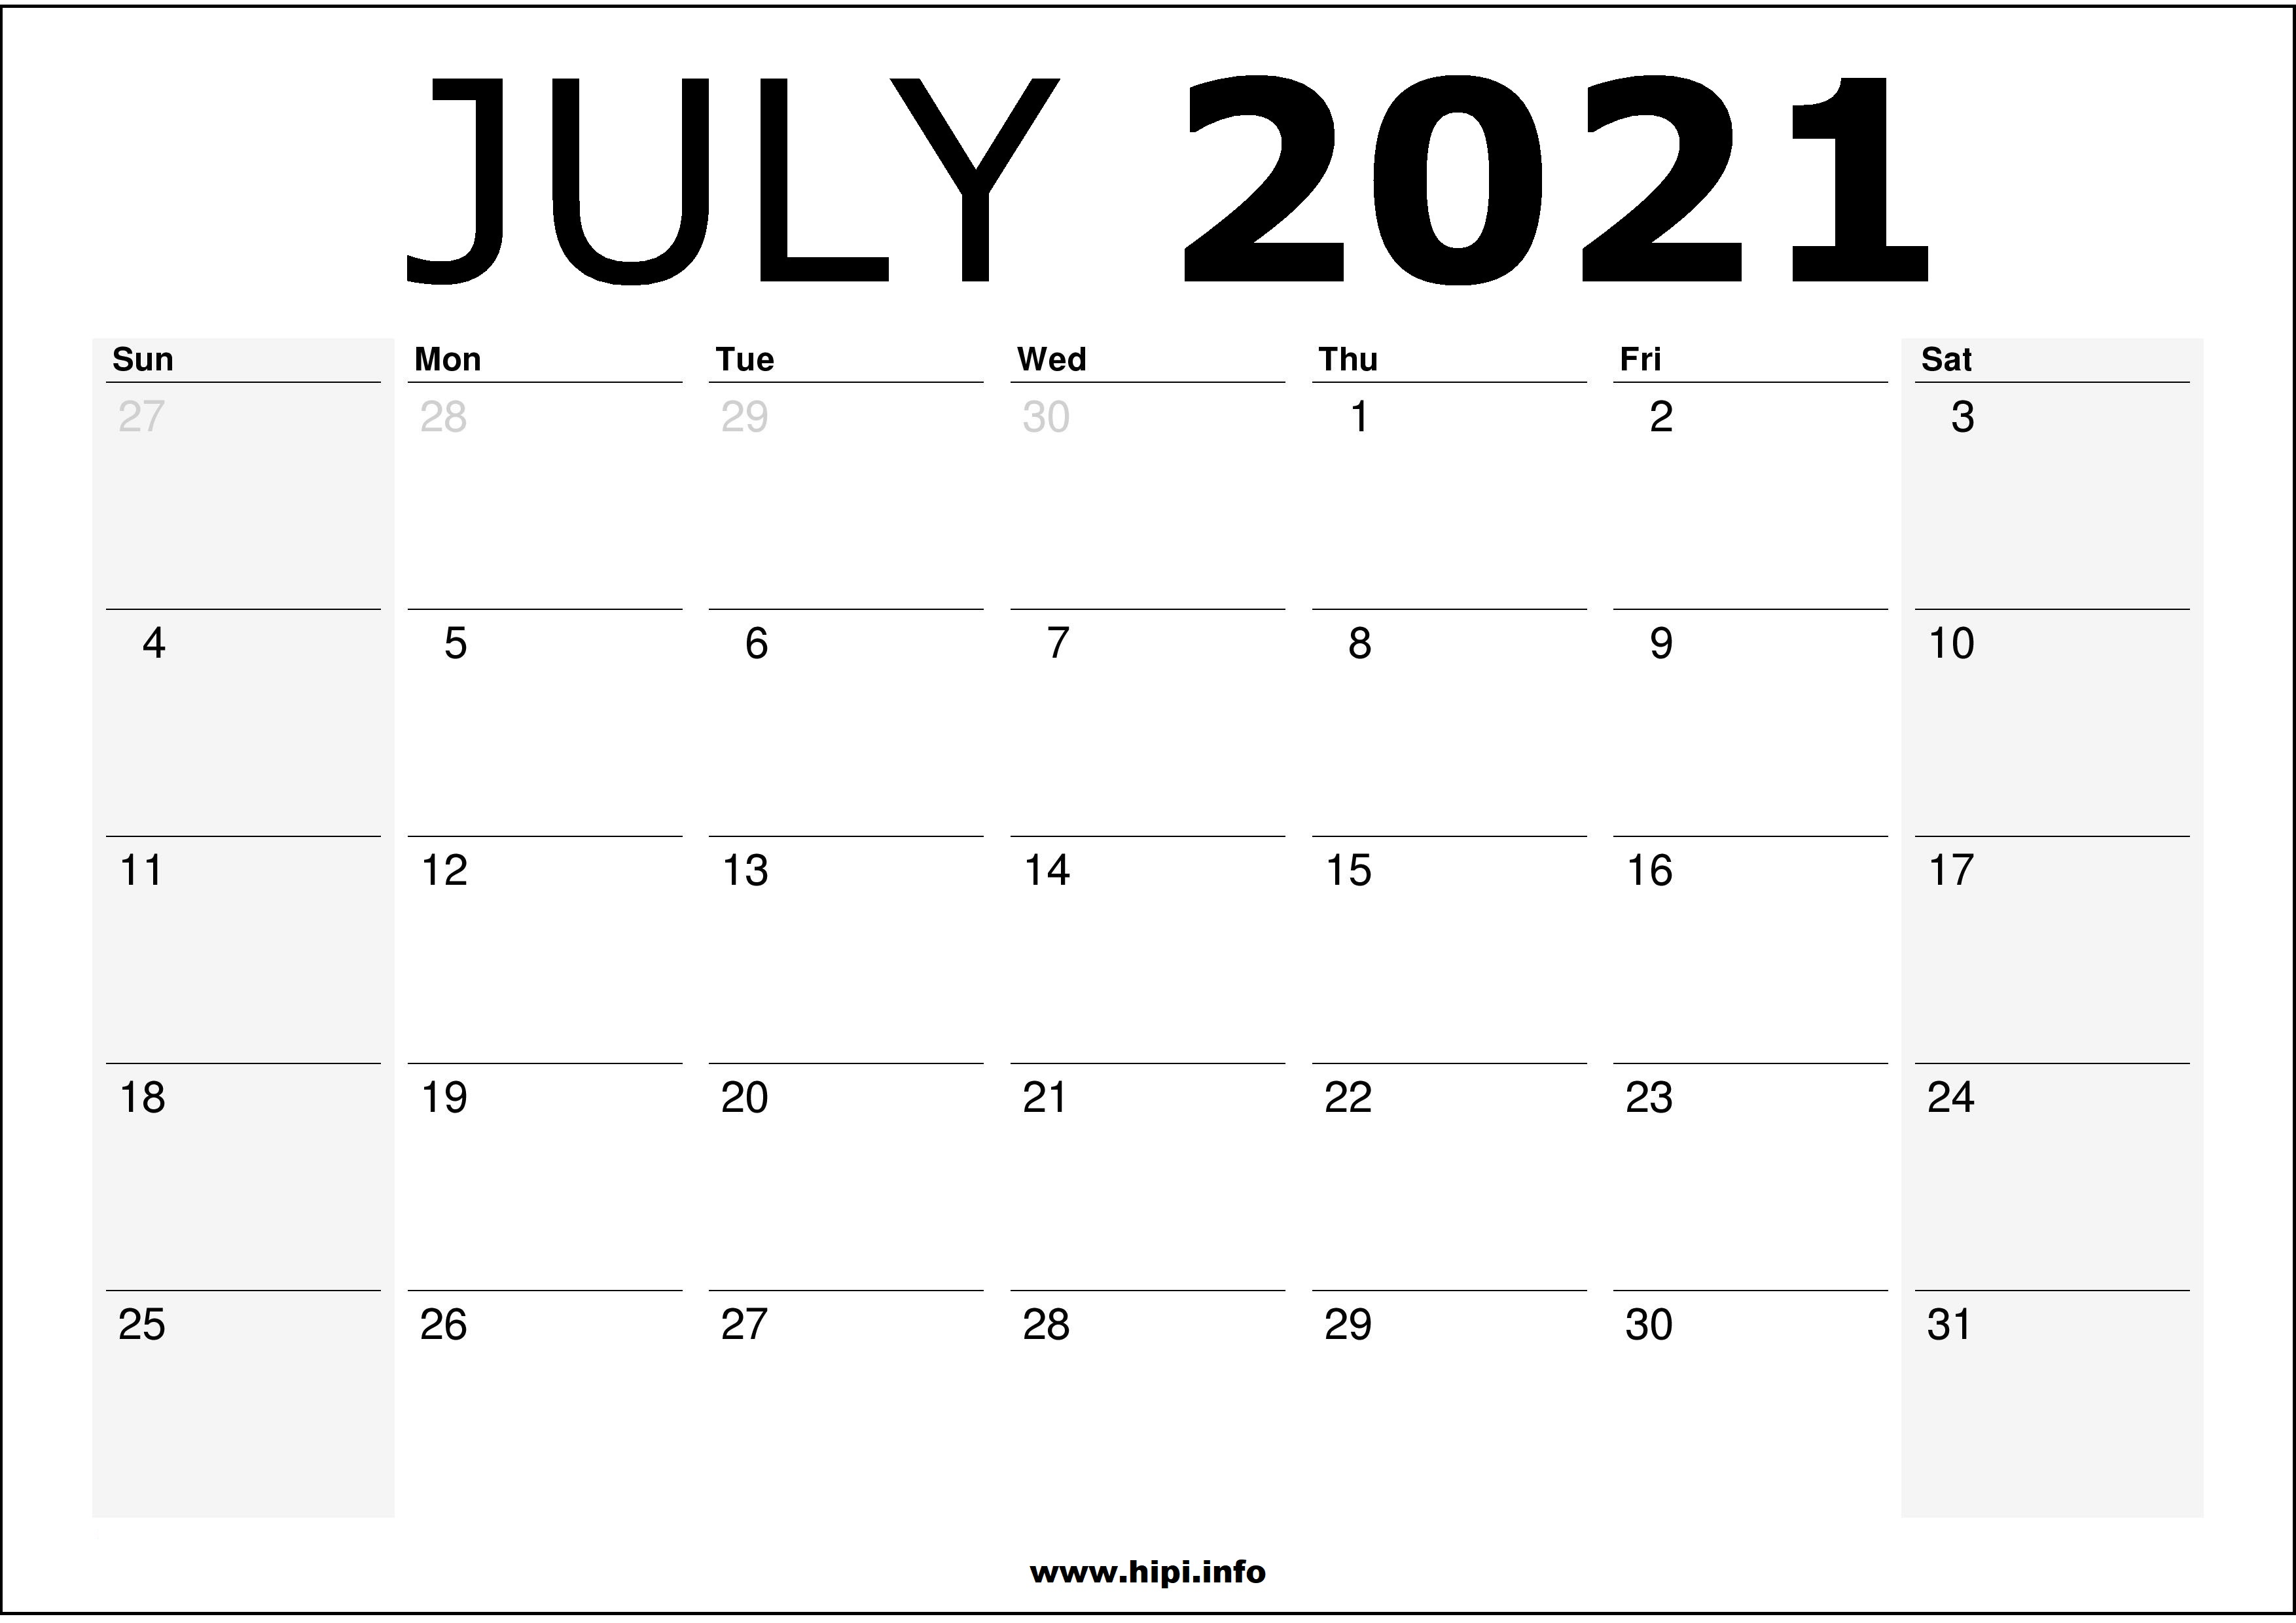 July 2021 Desktop Calendar | Lunar Calendar